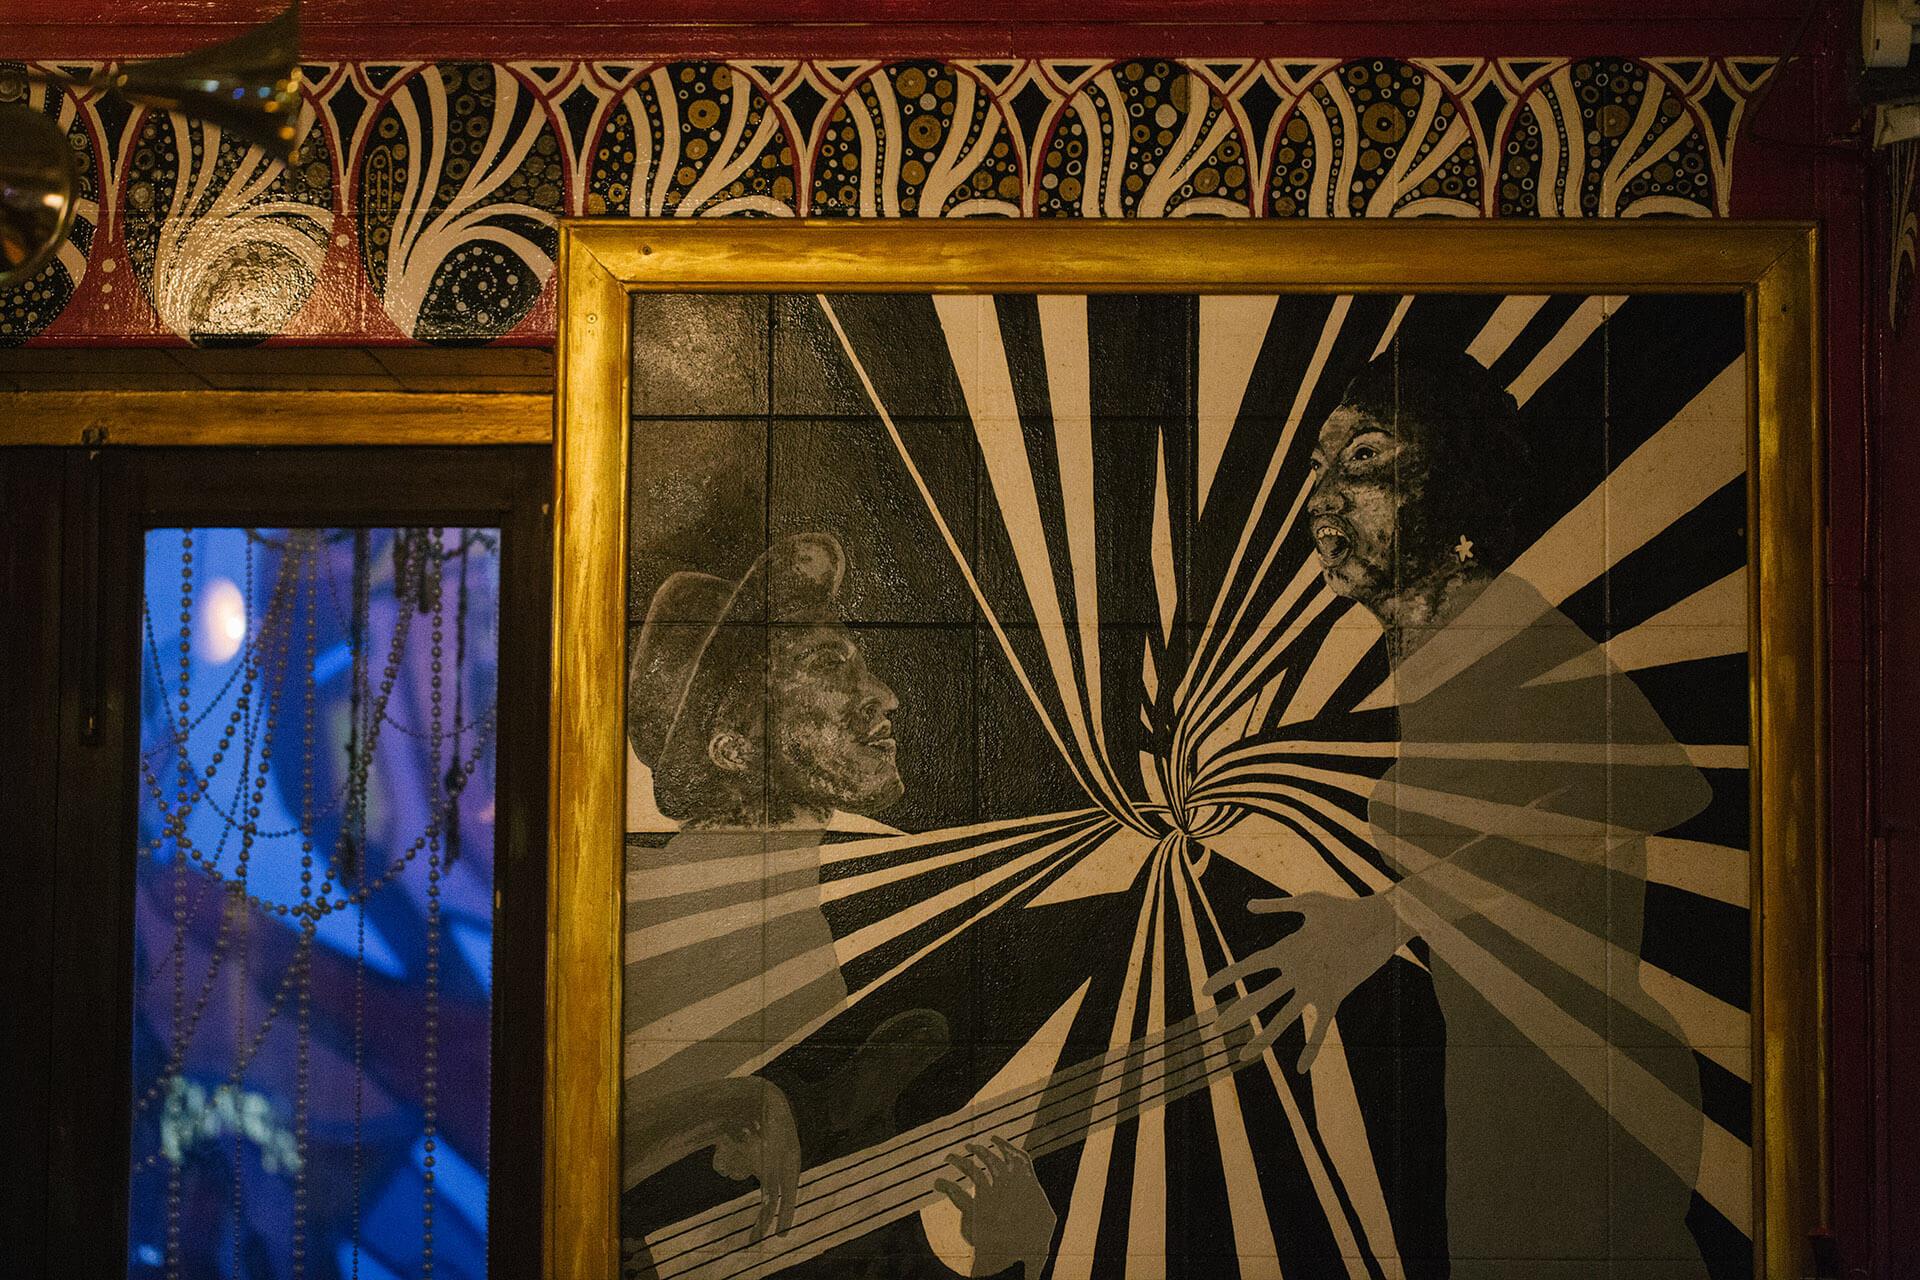 Blu Jaz Cafe內的畫作都是老闆親自邀請當地藝術家創作。